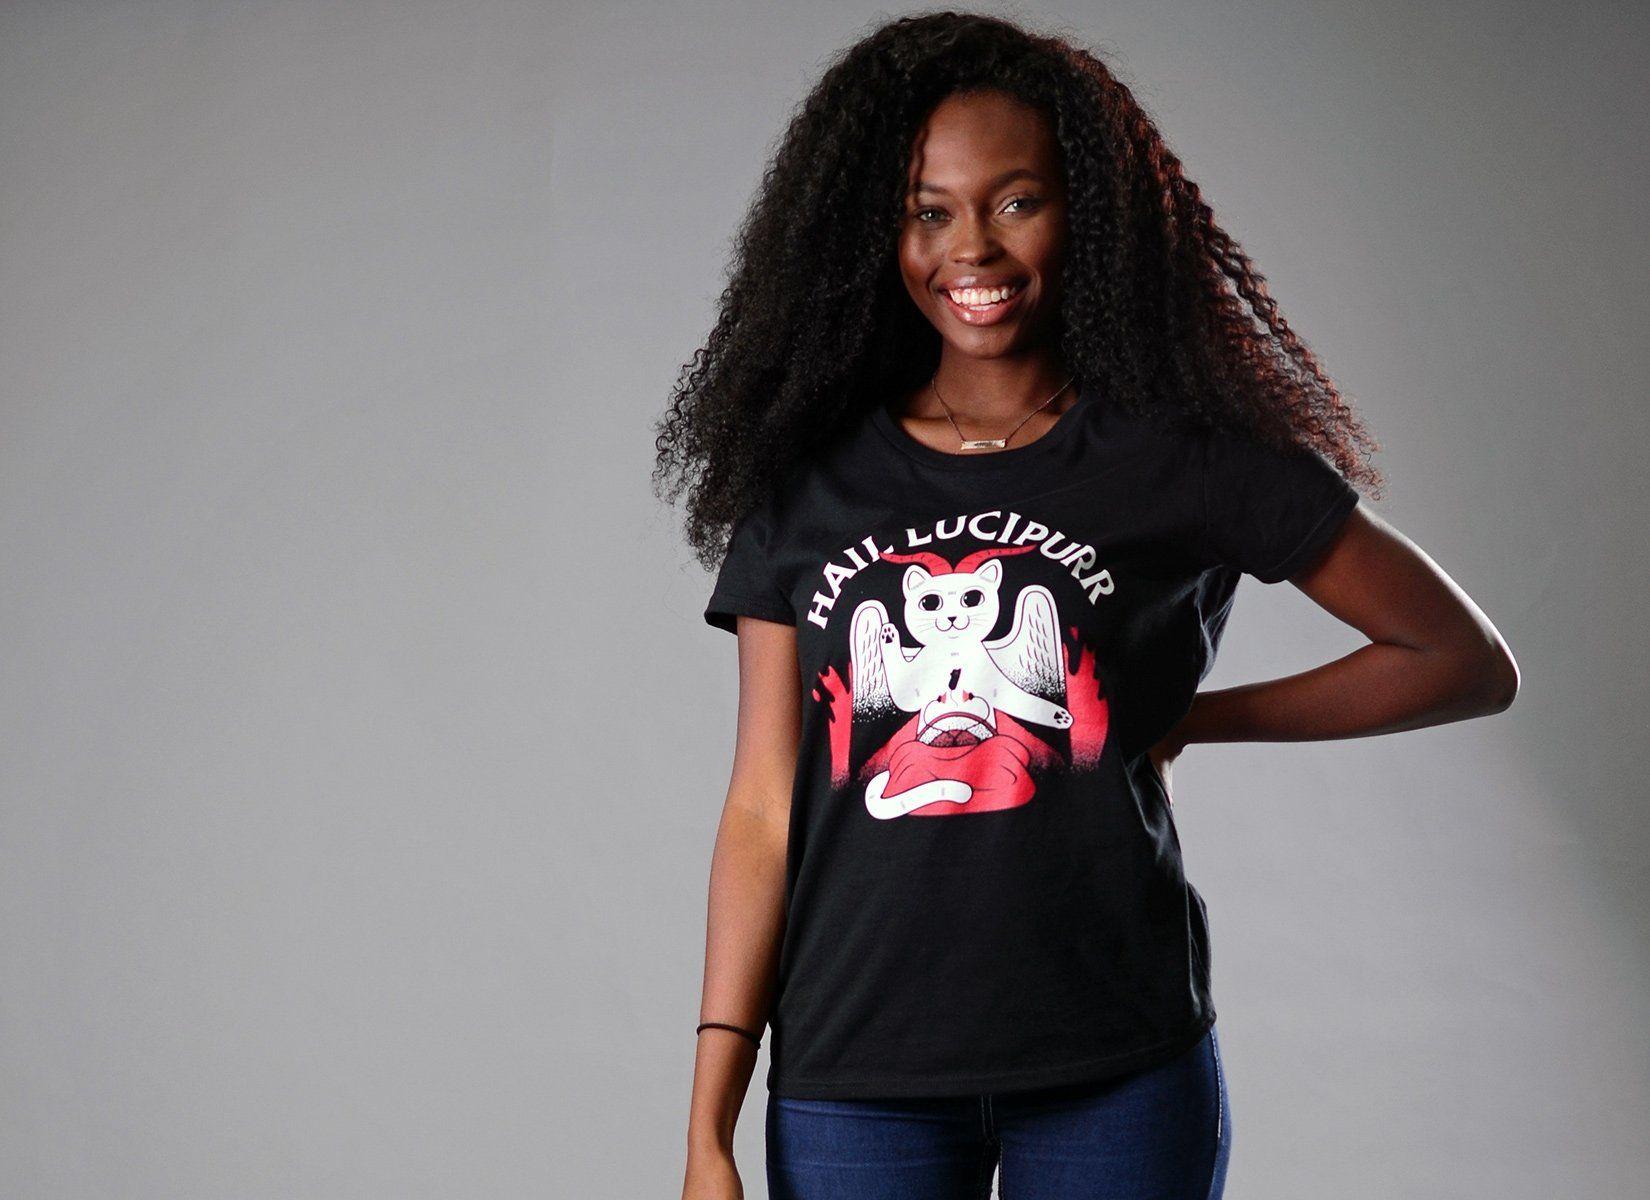 Hail Lucipurr T Shirt Snorgtees In 2020 Gray Hoodies Heather Gray Tee Shirts